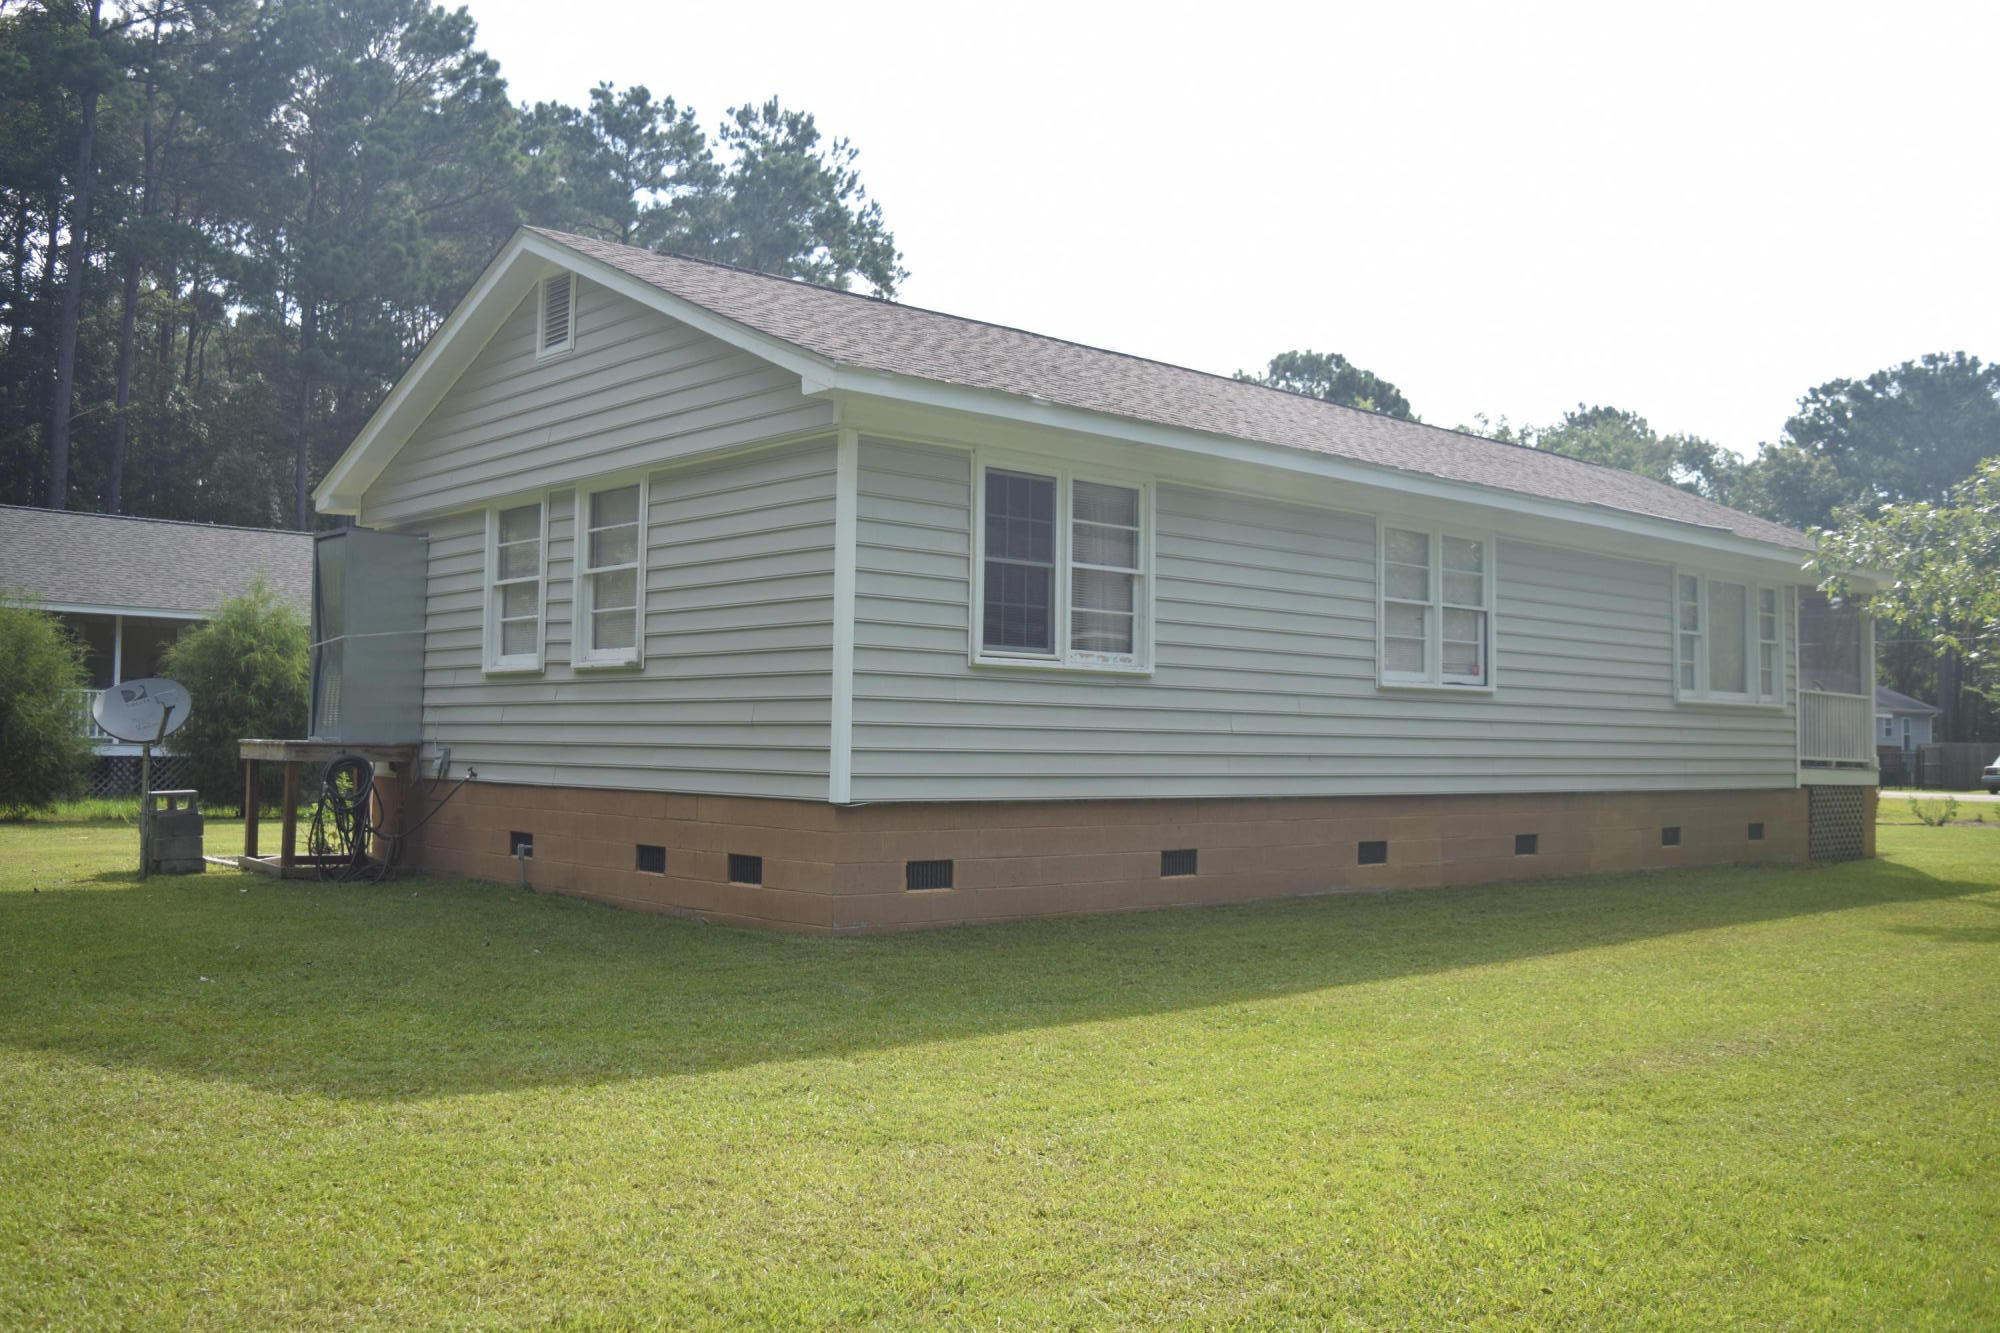 Ravenel Acres Homes For Sale - 2962 Bobo, Mount Pleasant, SC - 5